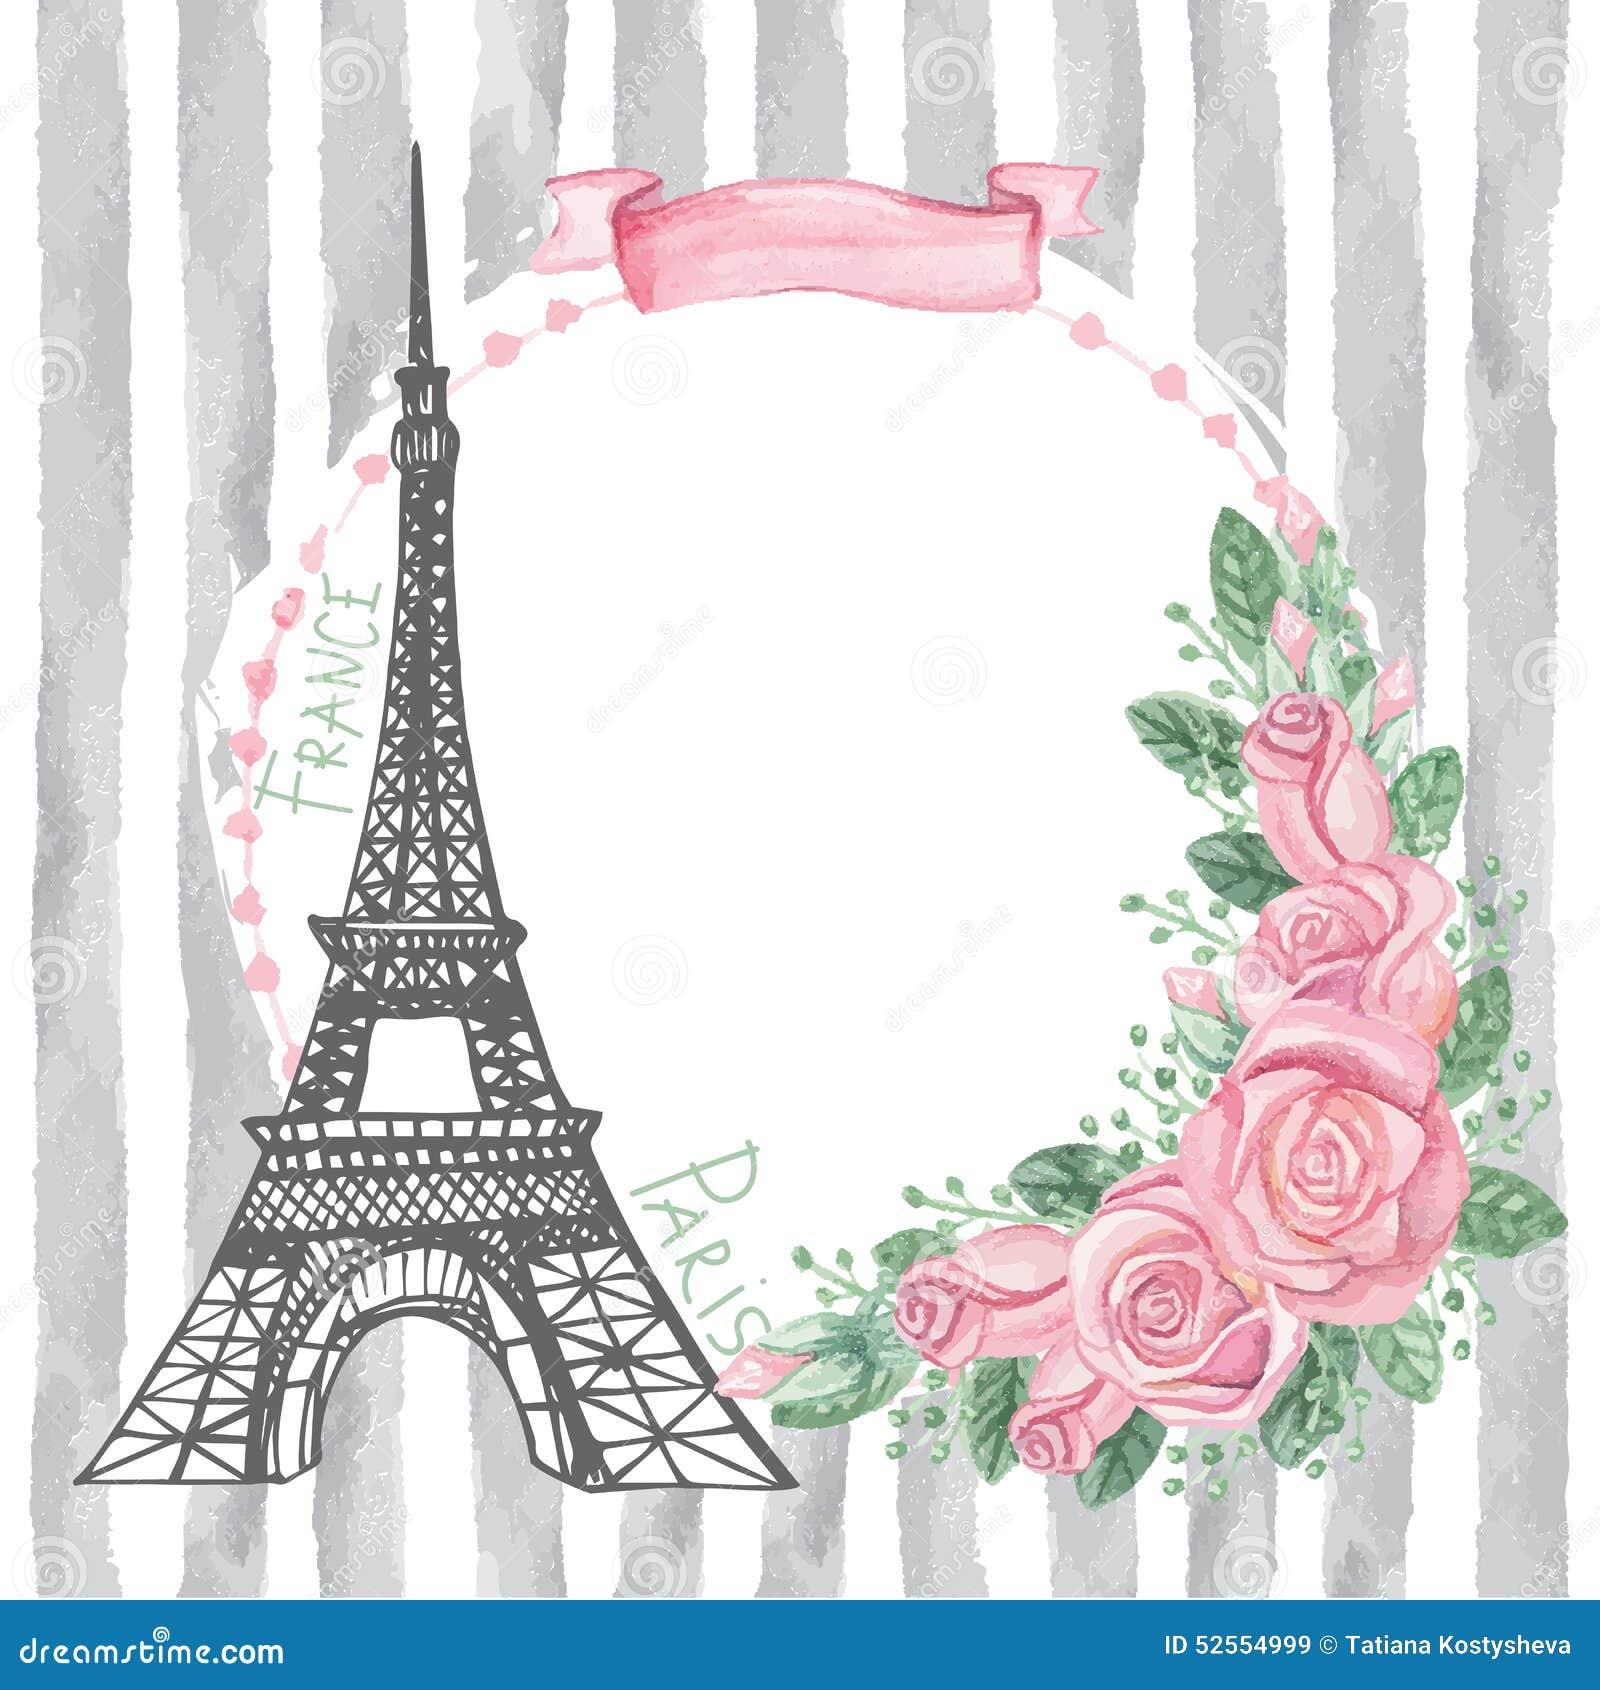 Paris Themed Party Invitations as beautiful invitation example